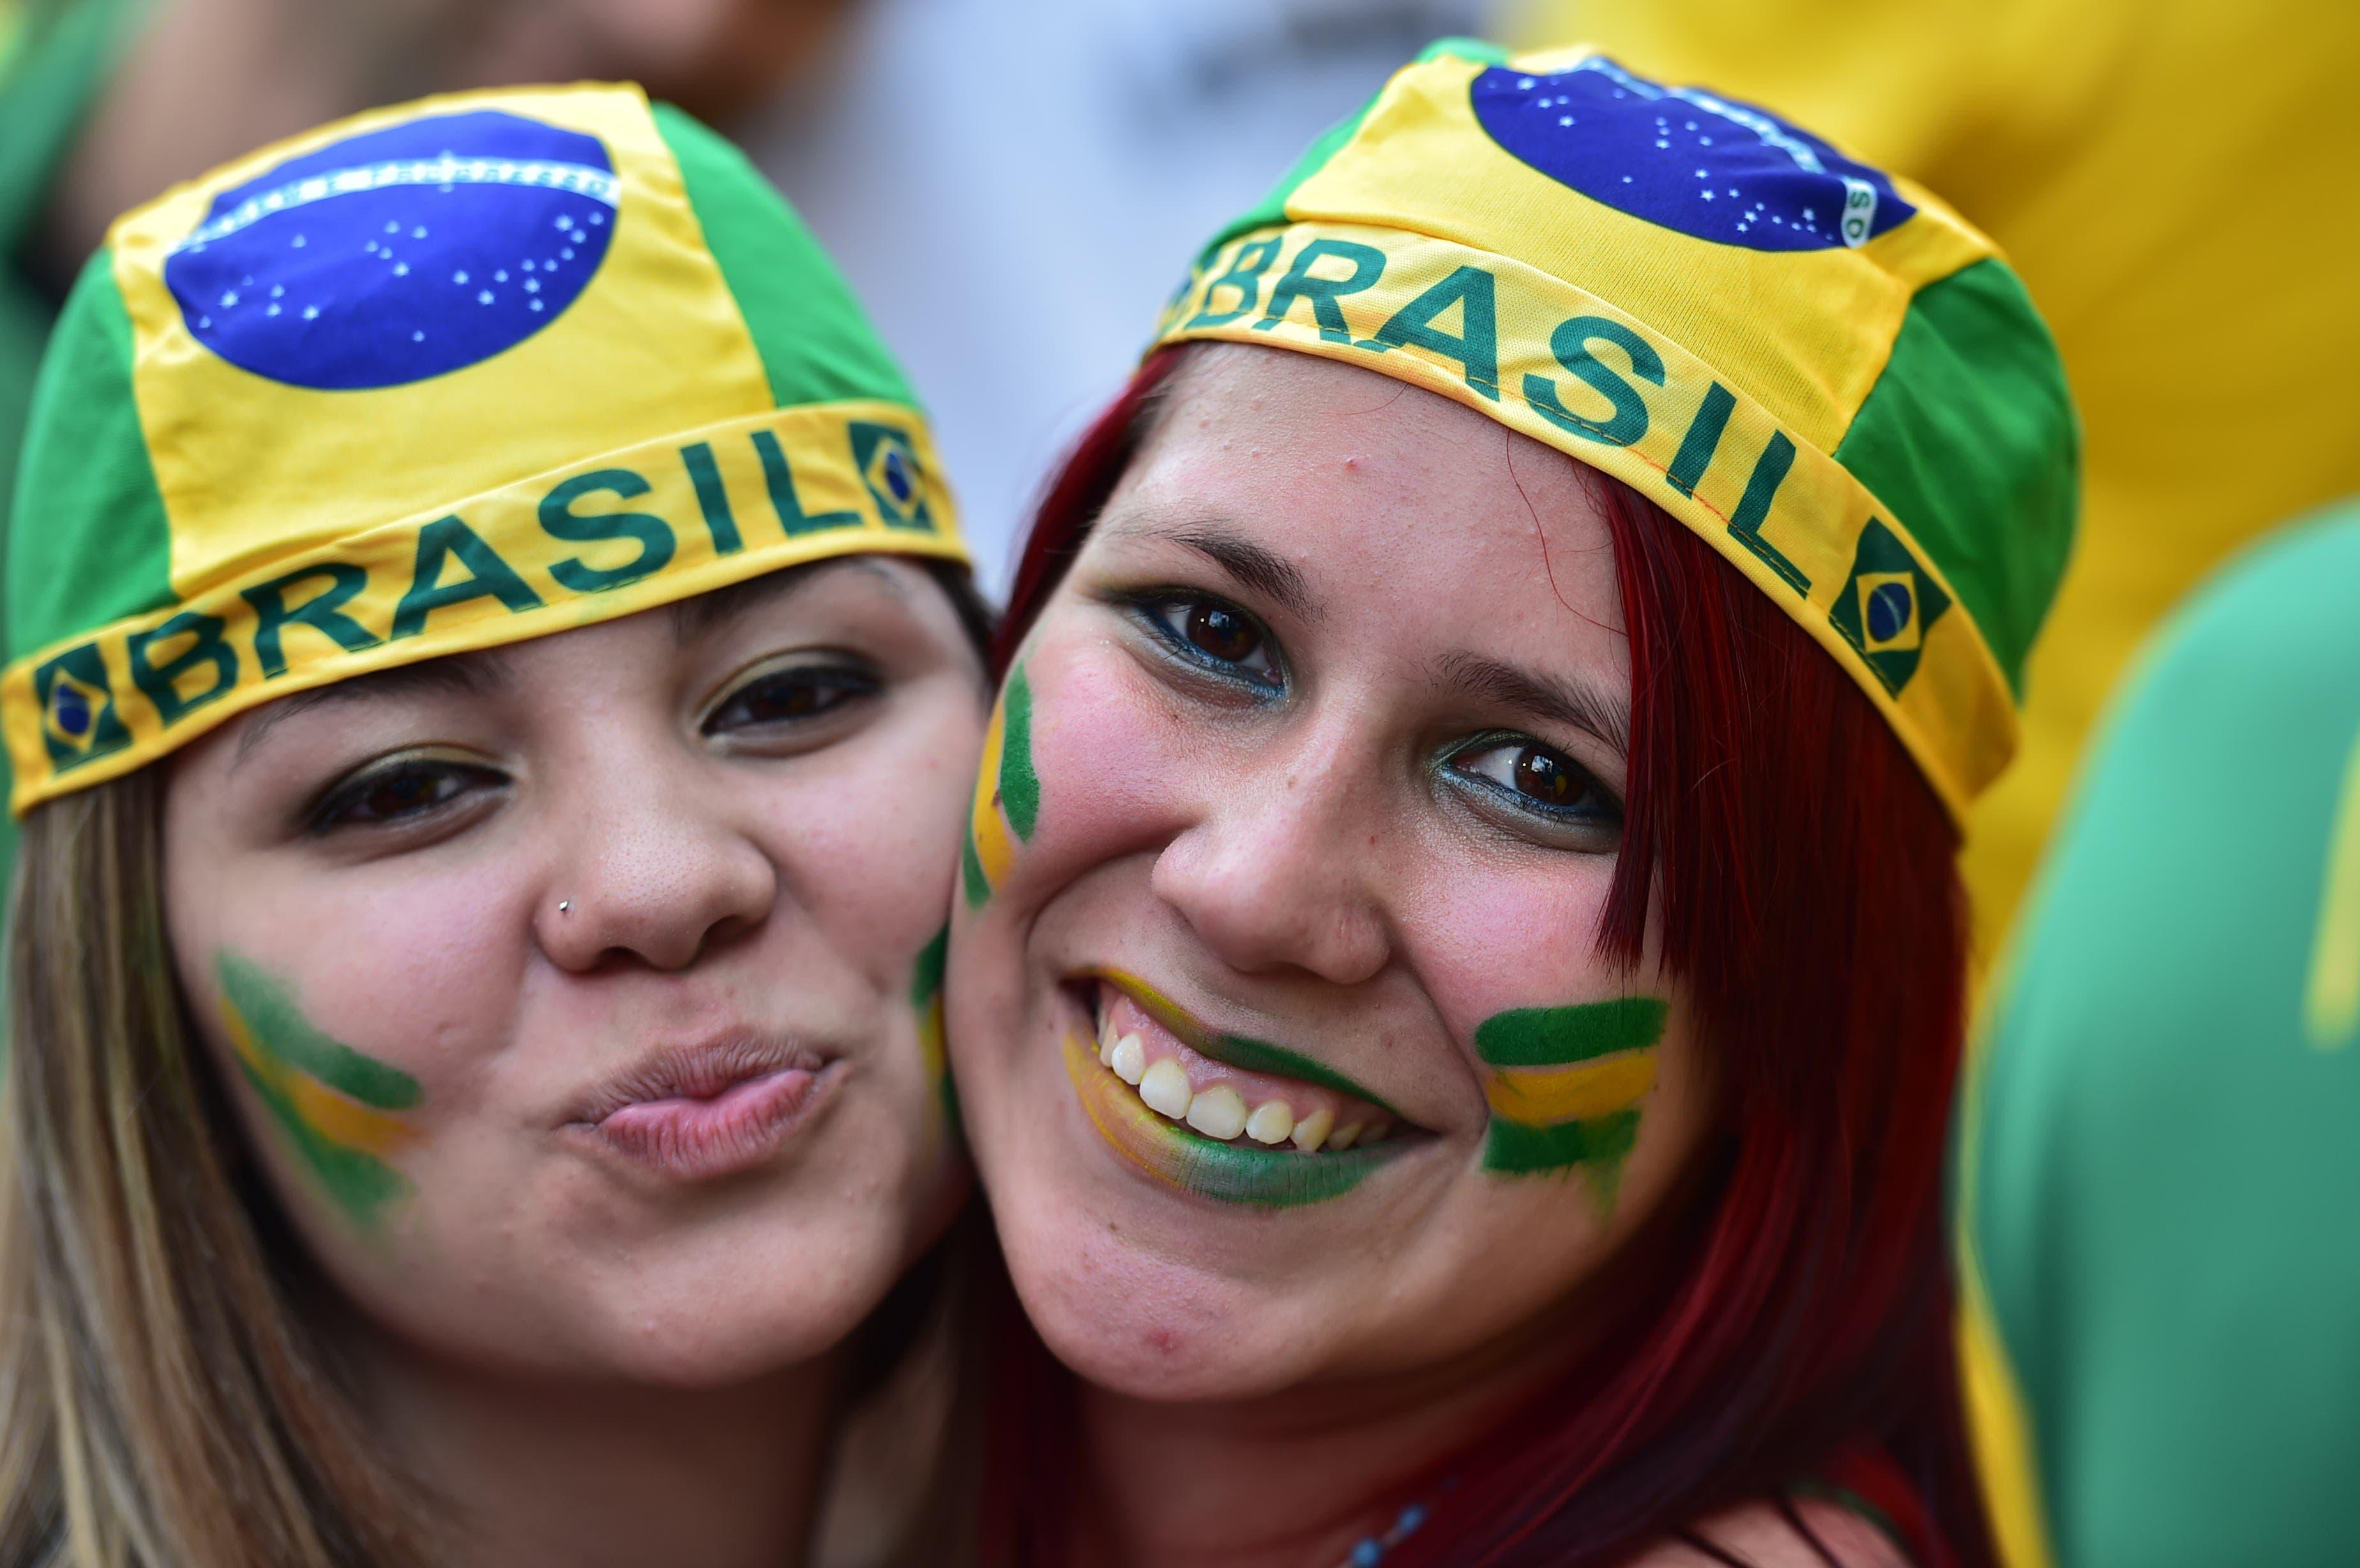 Brazilian fans attend the FIFA Fan Fest during the Brazil vs Colombia quarter-final football match. (AFP)